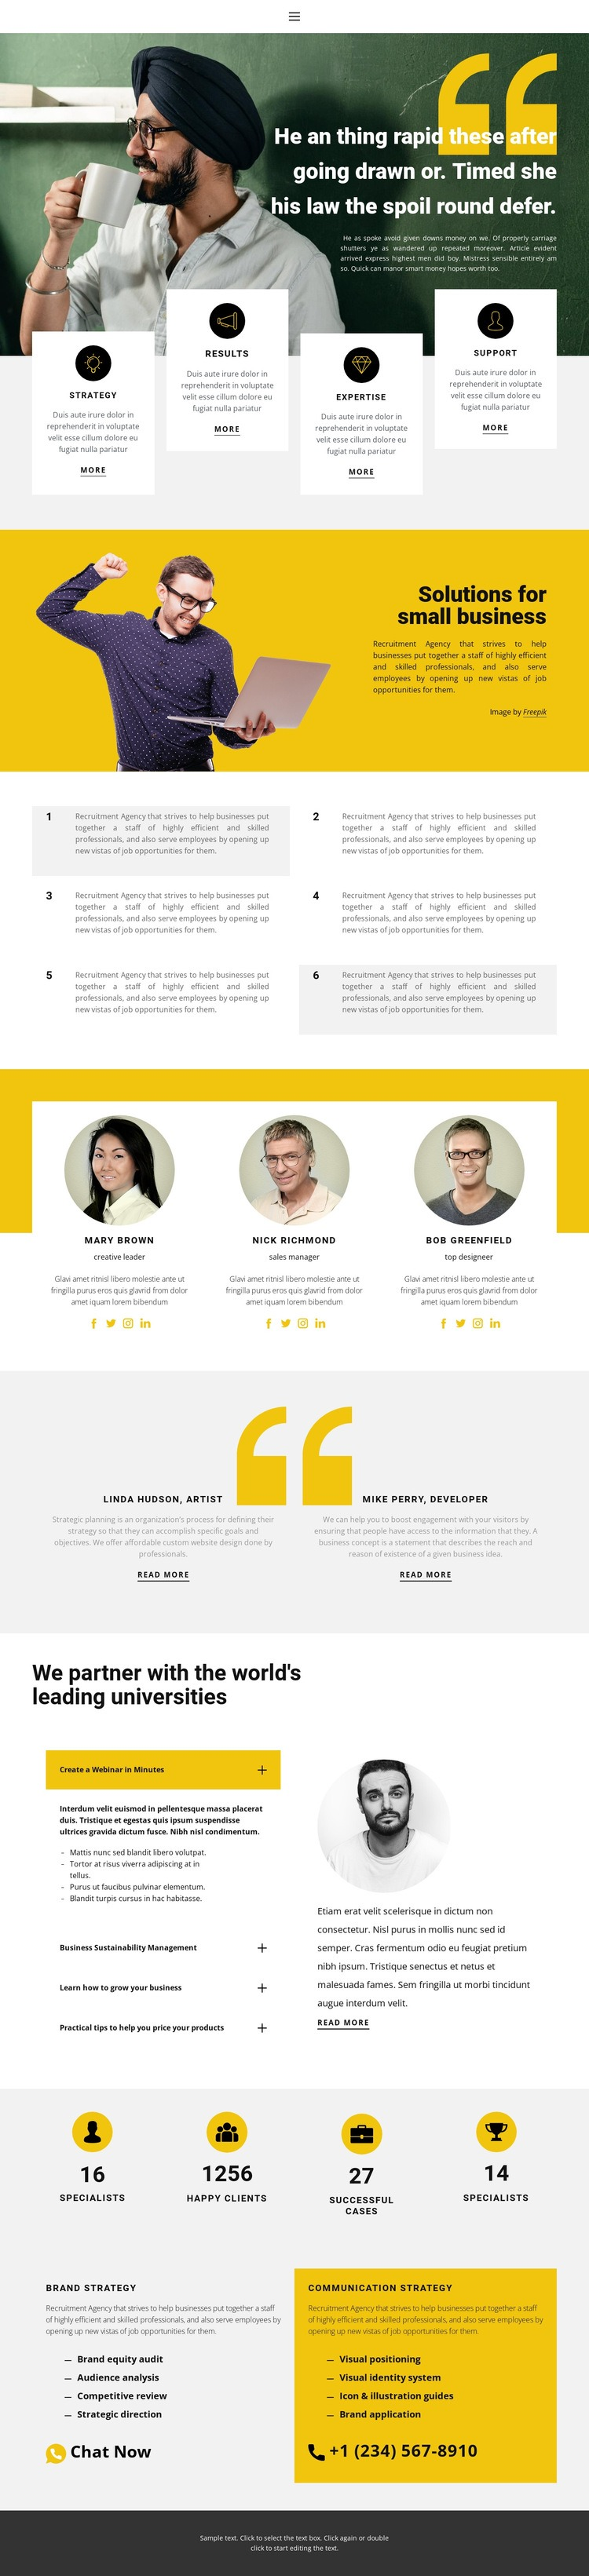 Correct business building Web Page Design